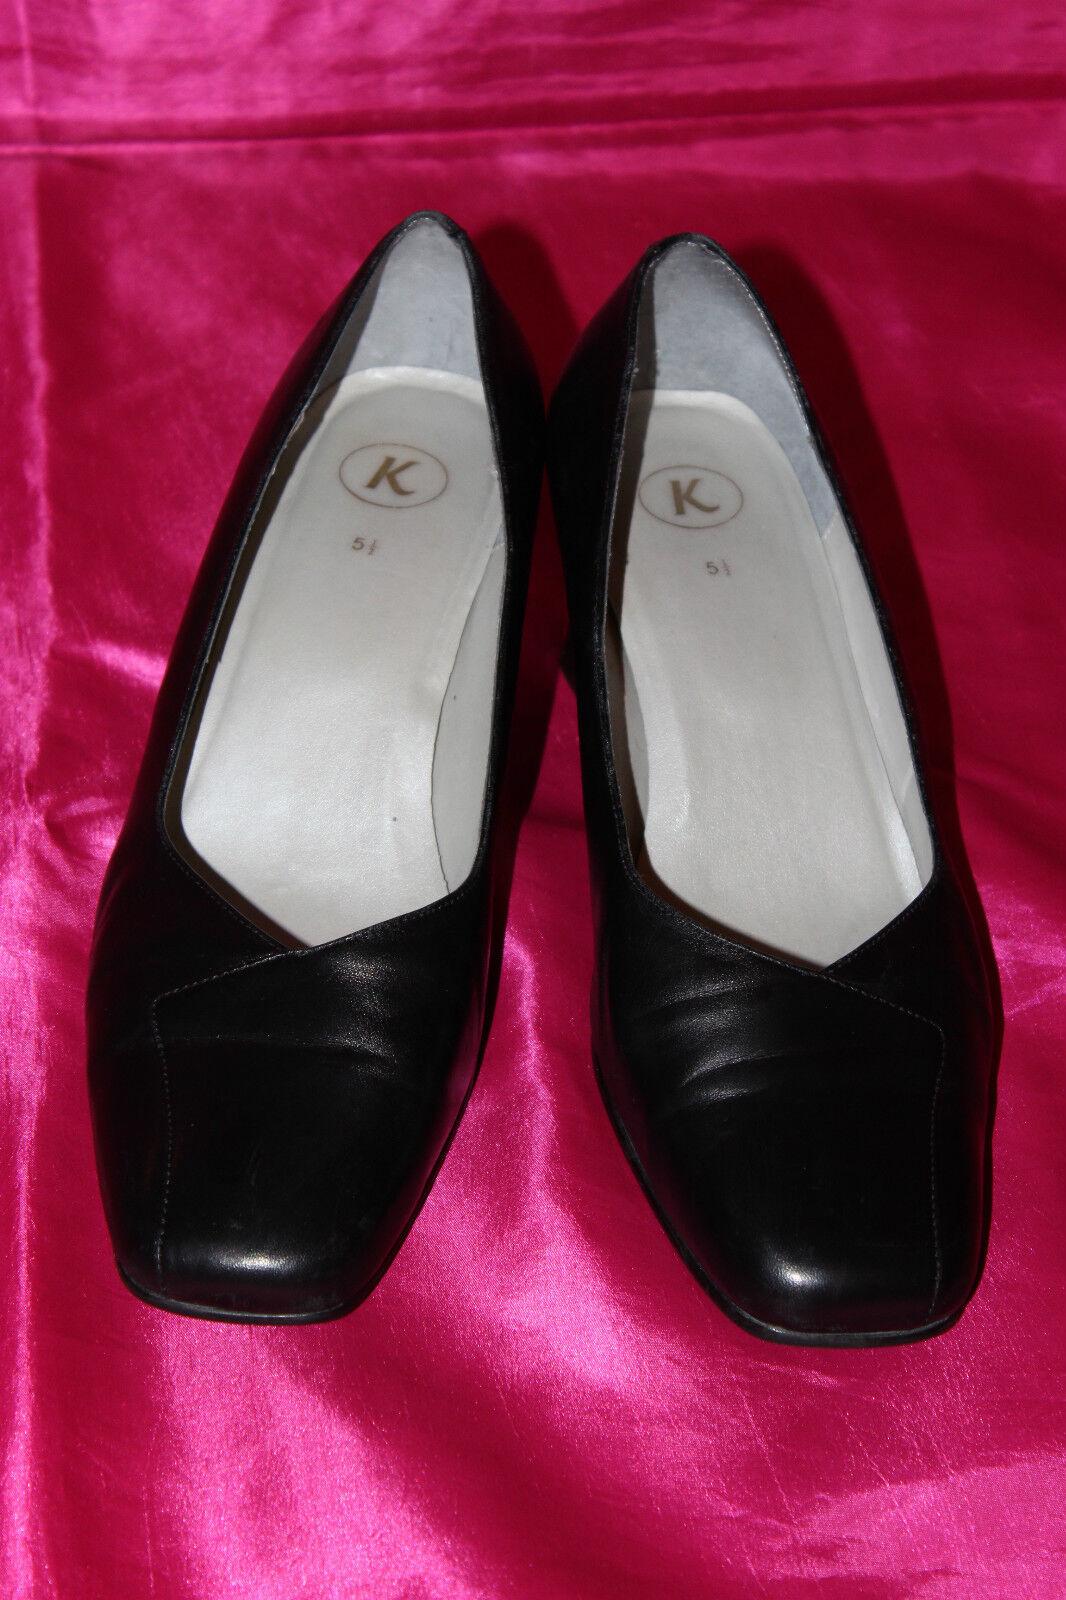 CLARKS  Black Black Black Genuine  Leather Ladies shoes Heels Size 5.5 98a460